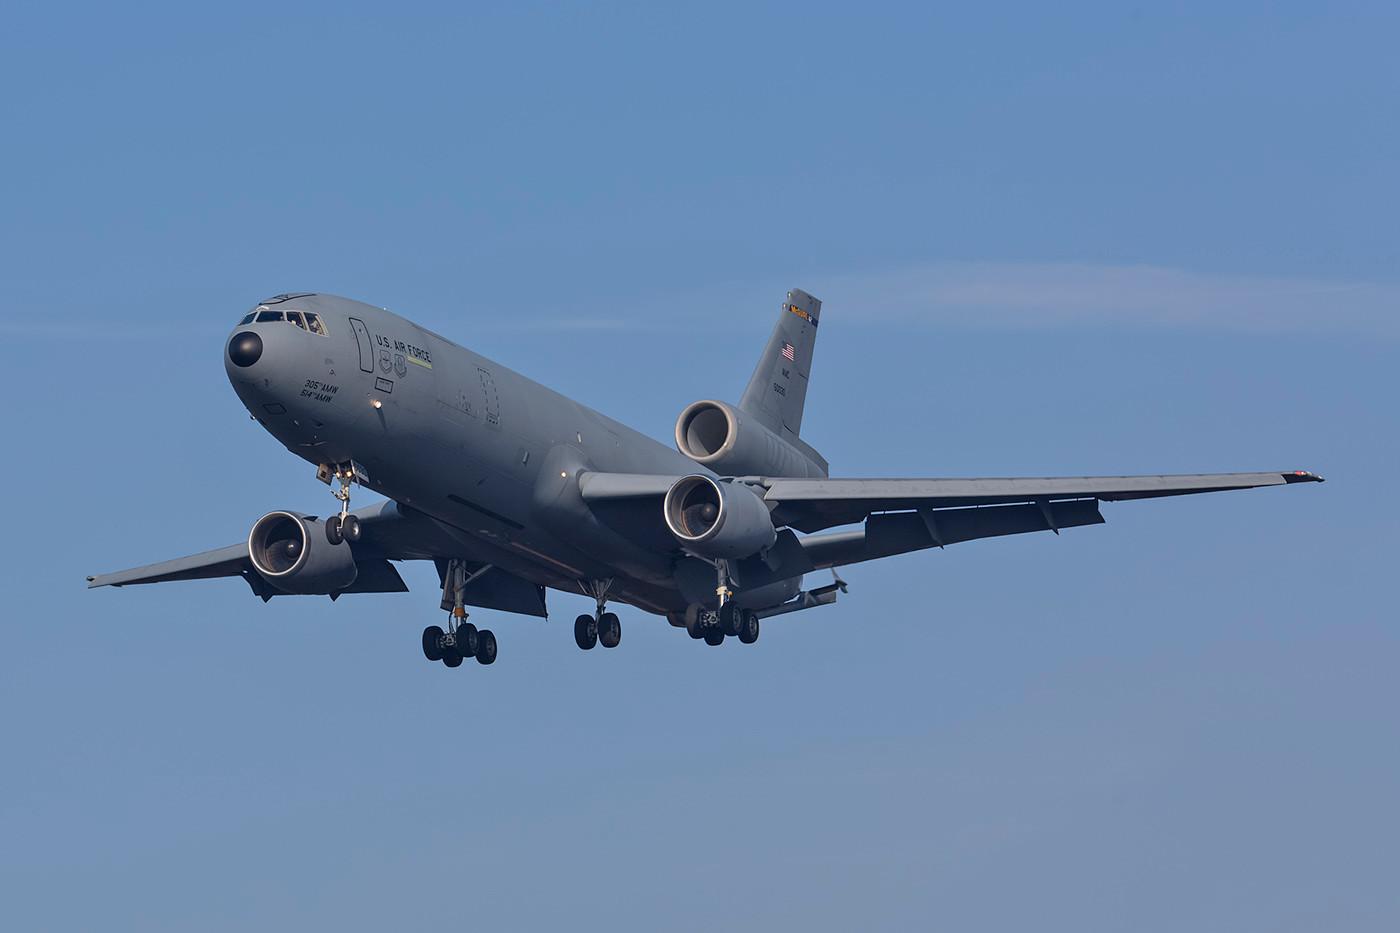 SPM 13.02.2015; 85-0030, KC-10A, 305th AMW Joint Base McGuire-Dix-Lakehurst (New Jersey)